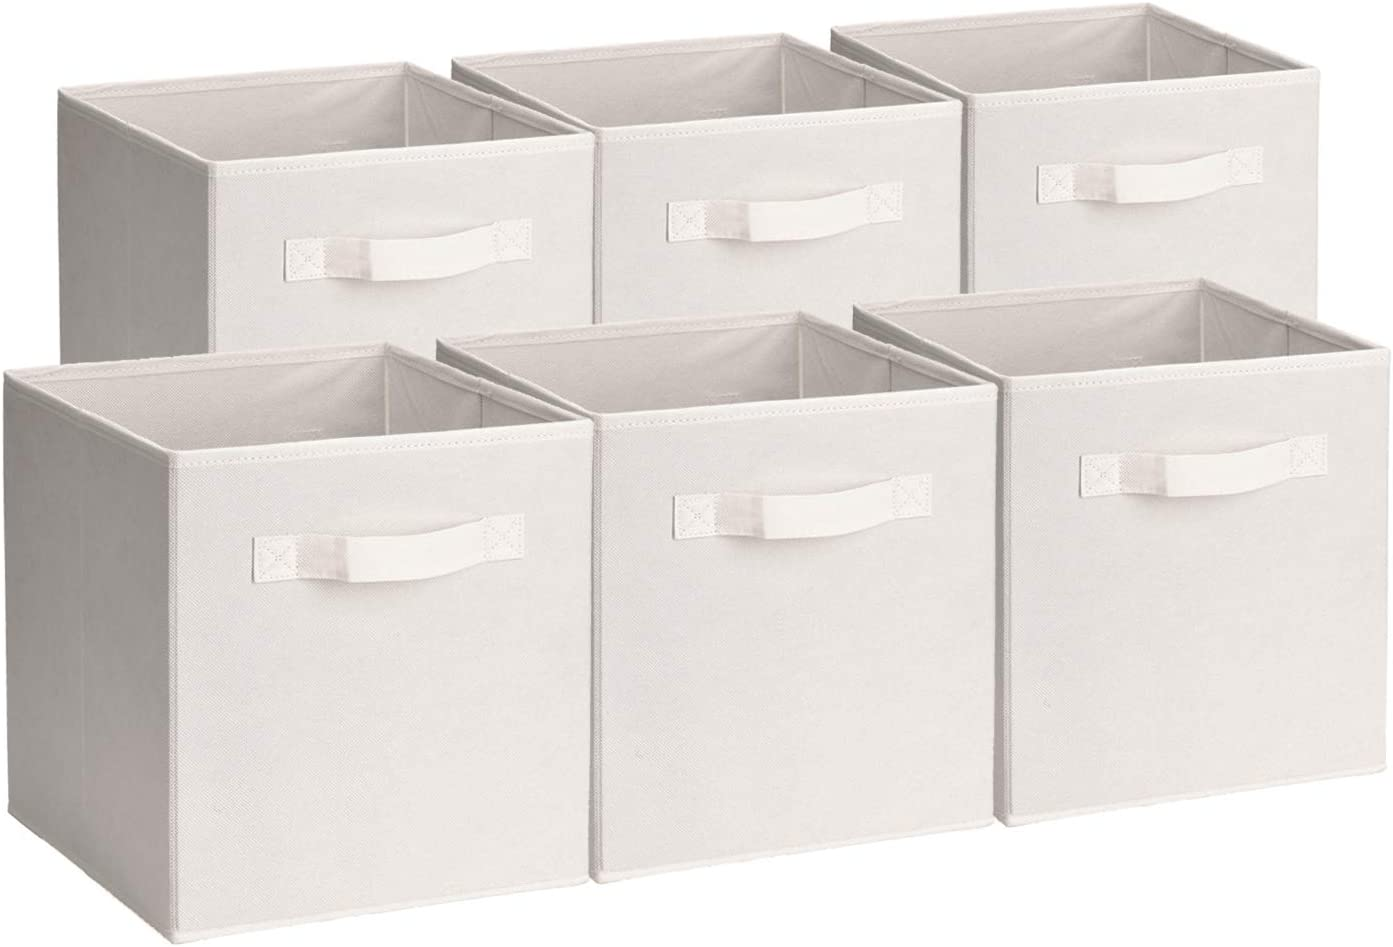 UMI. by Amazon - Cubos de Almacenaje de Tela, Cajas de Almacenaje Plegables, Set de 6 Cajas de Almacenamiento, Cubos de Almacenaje sin Tapa para Hogar Oficina, Beige, 26,7 x 26,7 x 27,9 cm